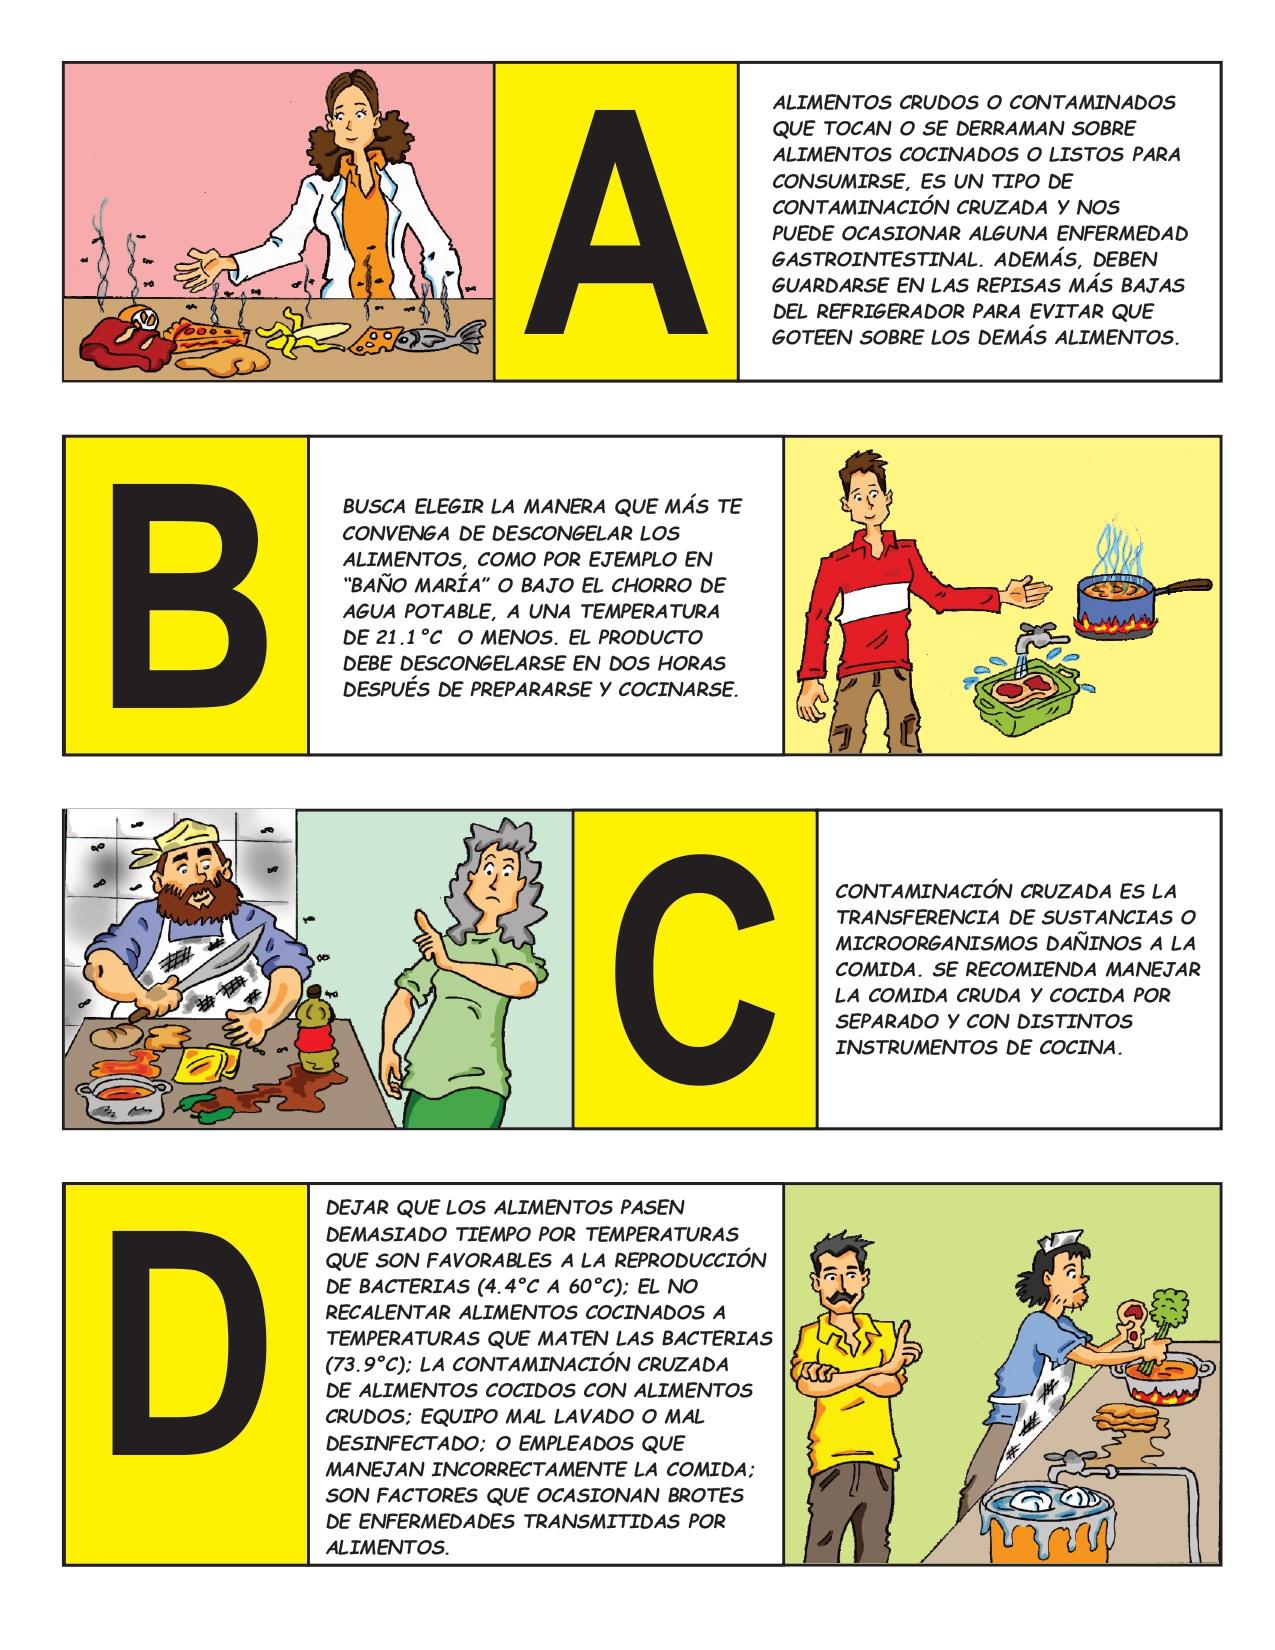 ABC higiene de alimentos digital_page-0003